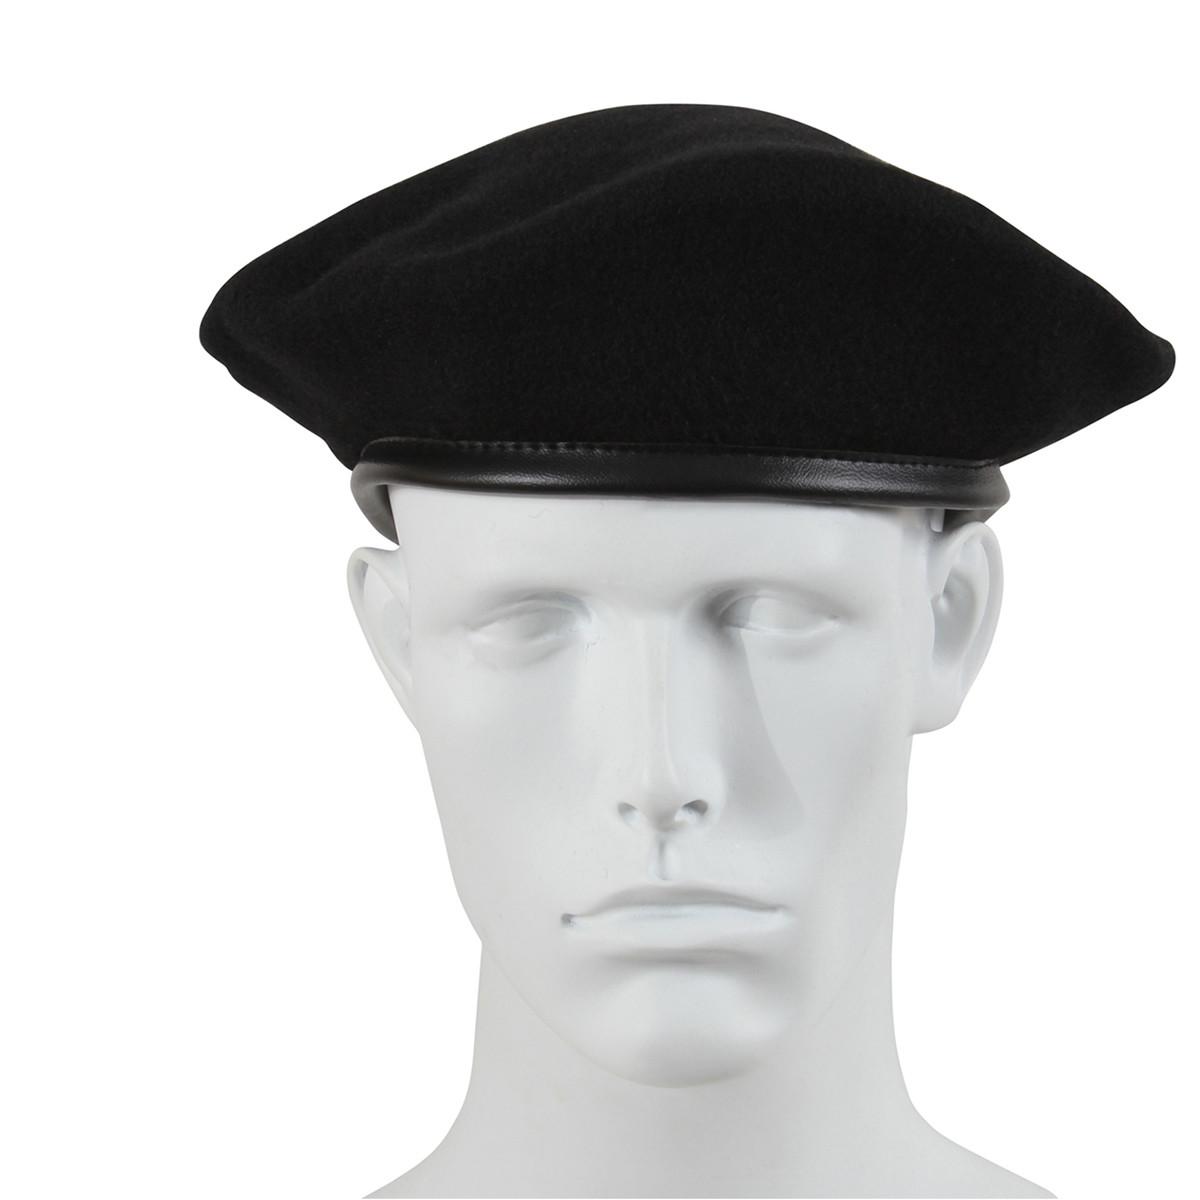 f0368b9b175c7 Shop Military Style Black Wool Berets - Fatigues Army Navy Gear